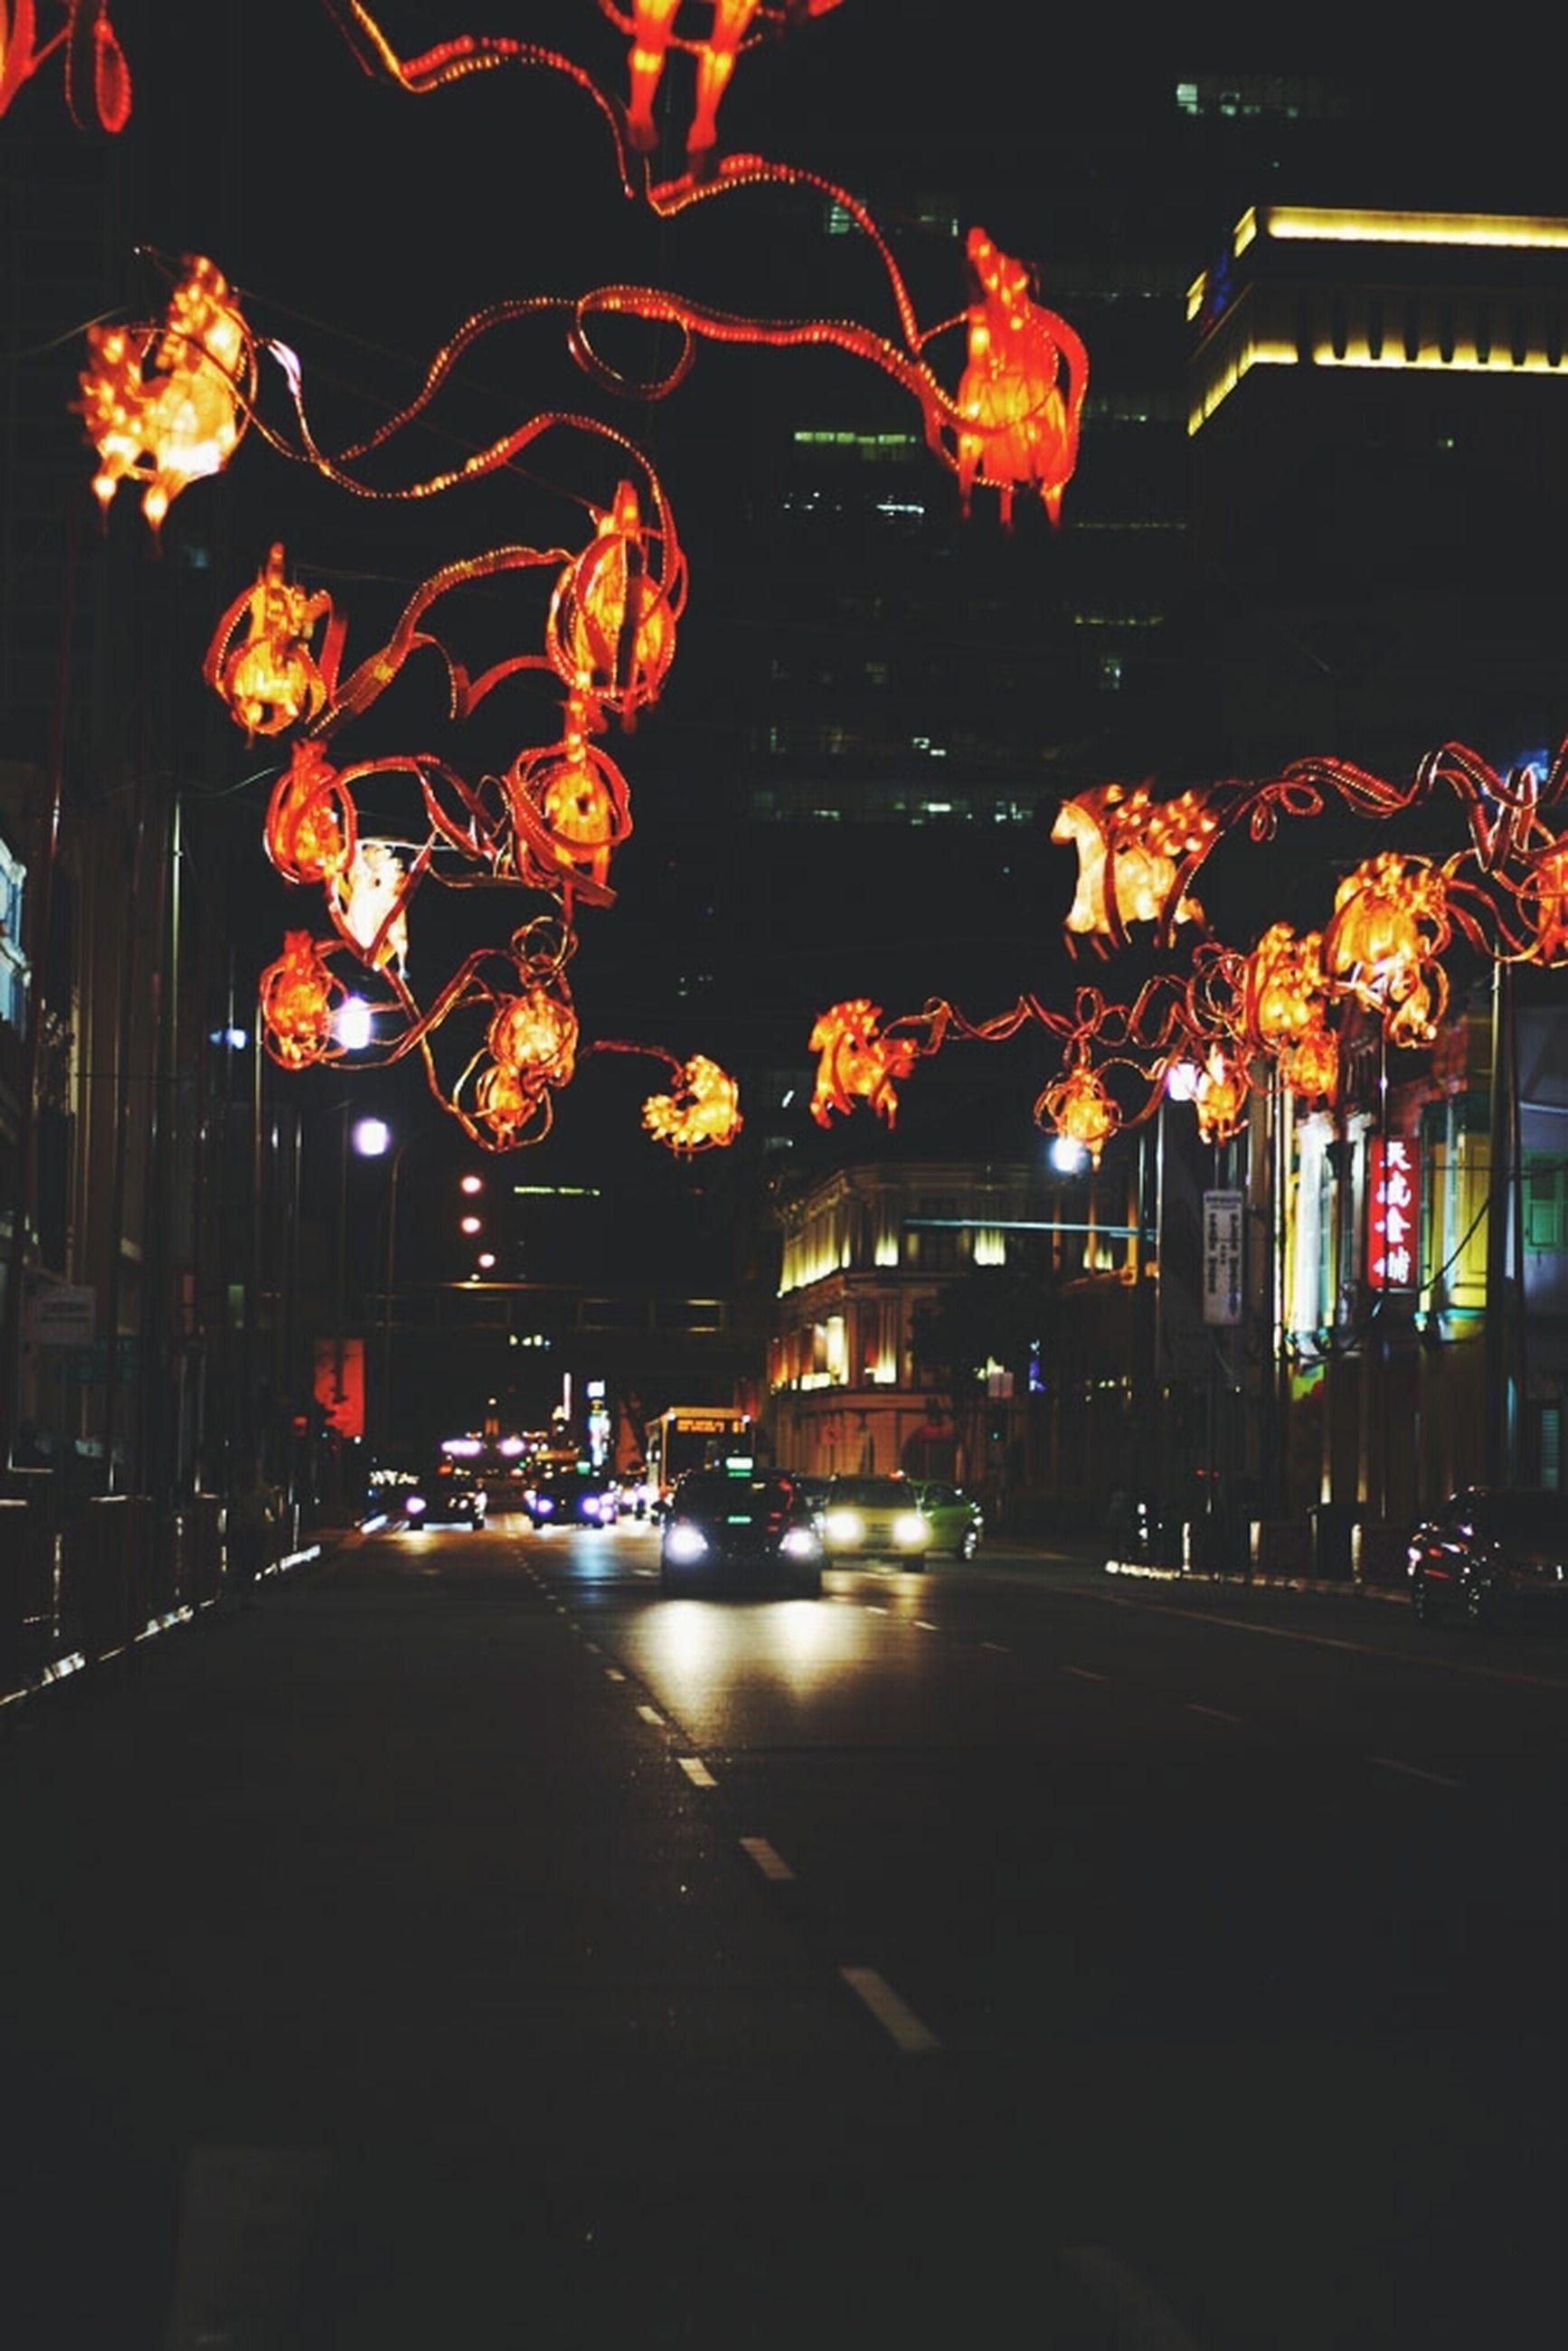 night, illuminated, street, lighting equipment, building exterior, street light, built structure, city, architecture, road, transportation, light - natural phenomenon, outdoors, incidental people, decoration, tree, city life, dark, glowing, no people